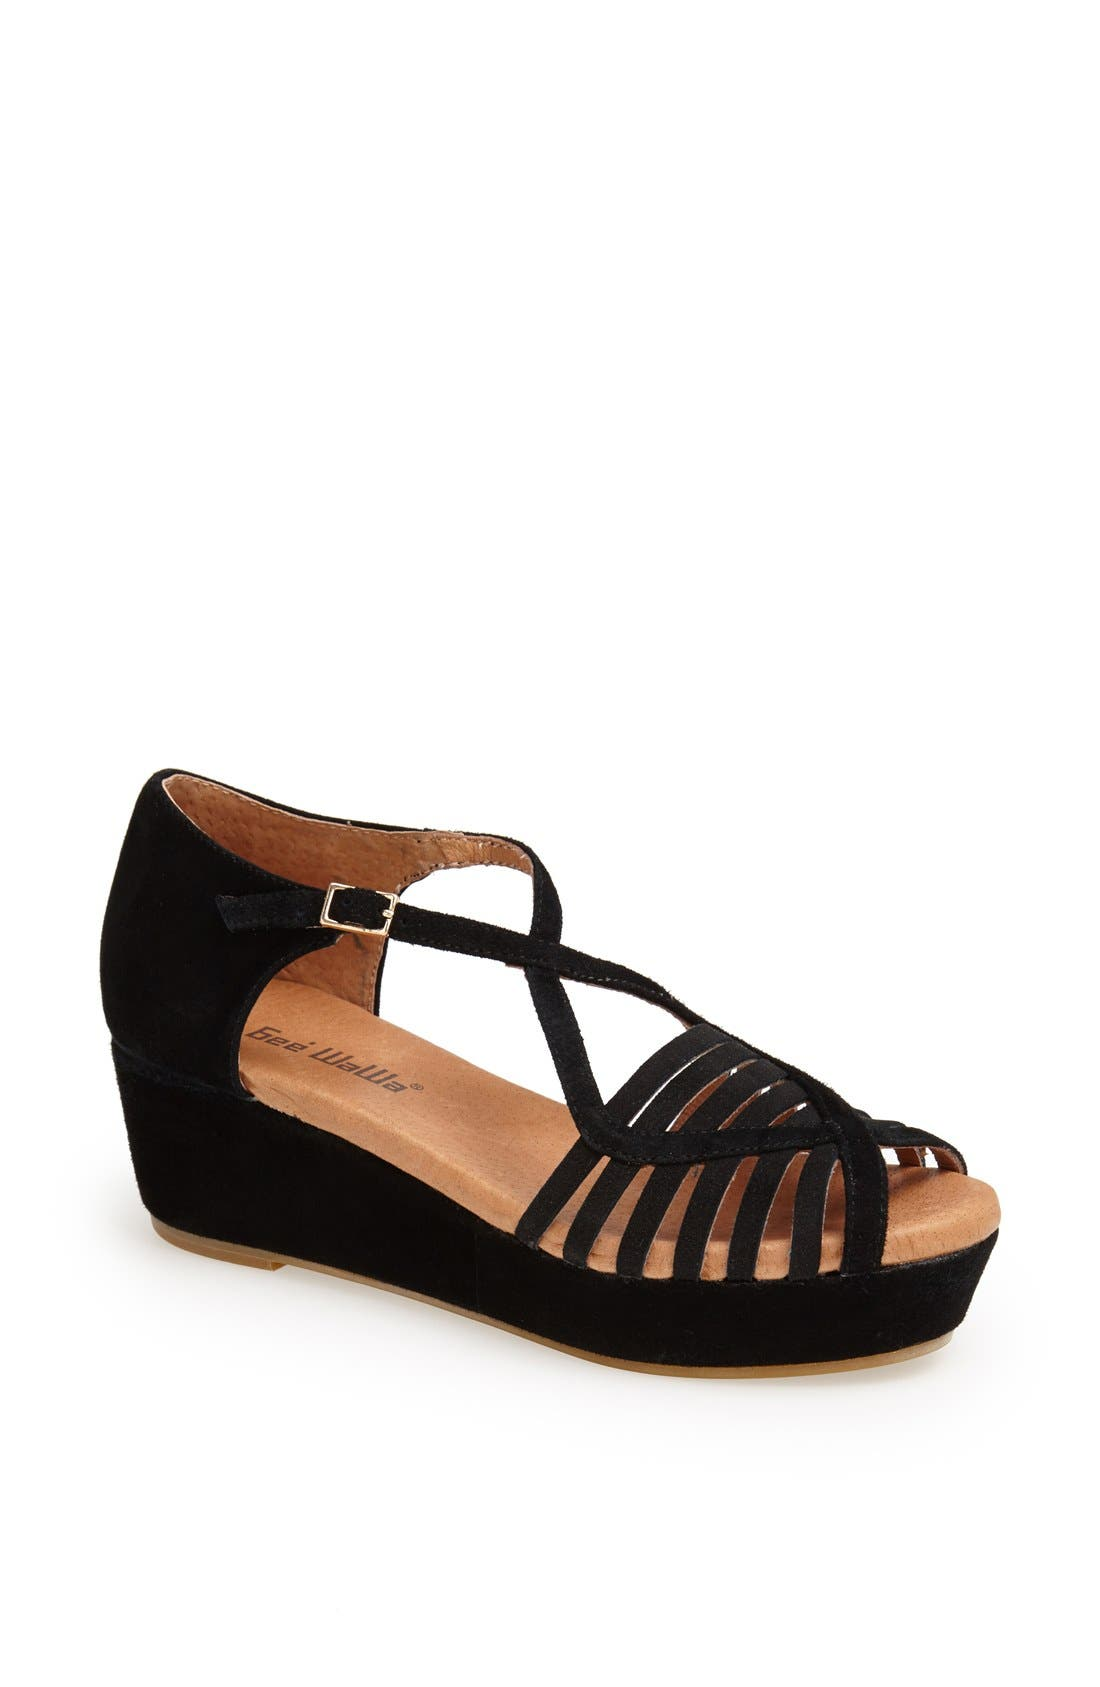 Alternate Image 1 Selected - Gee WaWa 'Doris' Sandal